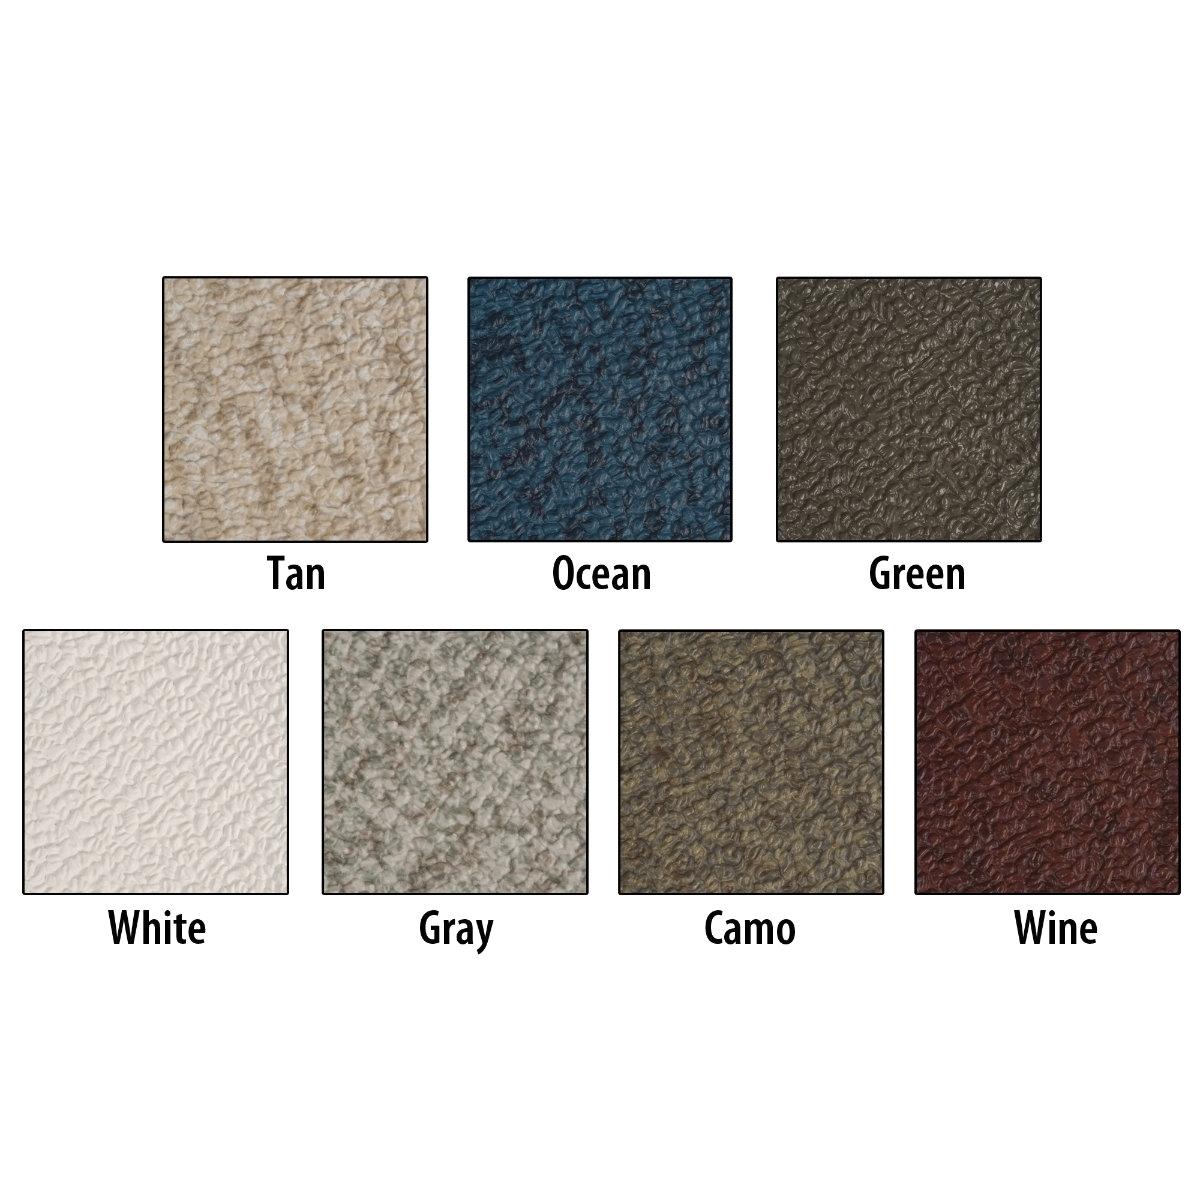 Marine Grade Teak Vinyl Flooring Marine Vinyl Flooring Beautiful Marideck Marine Vinyl Flooring